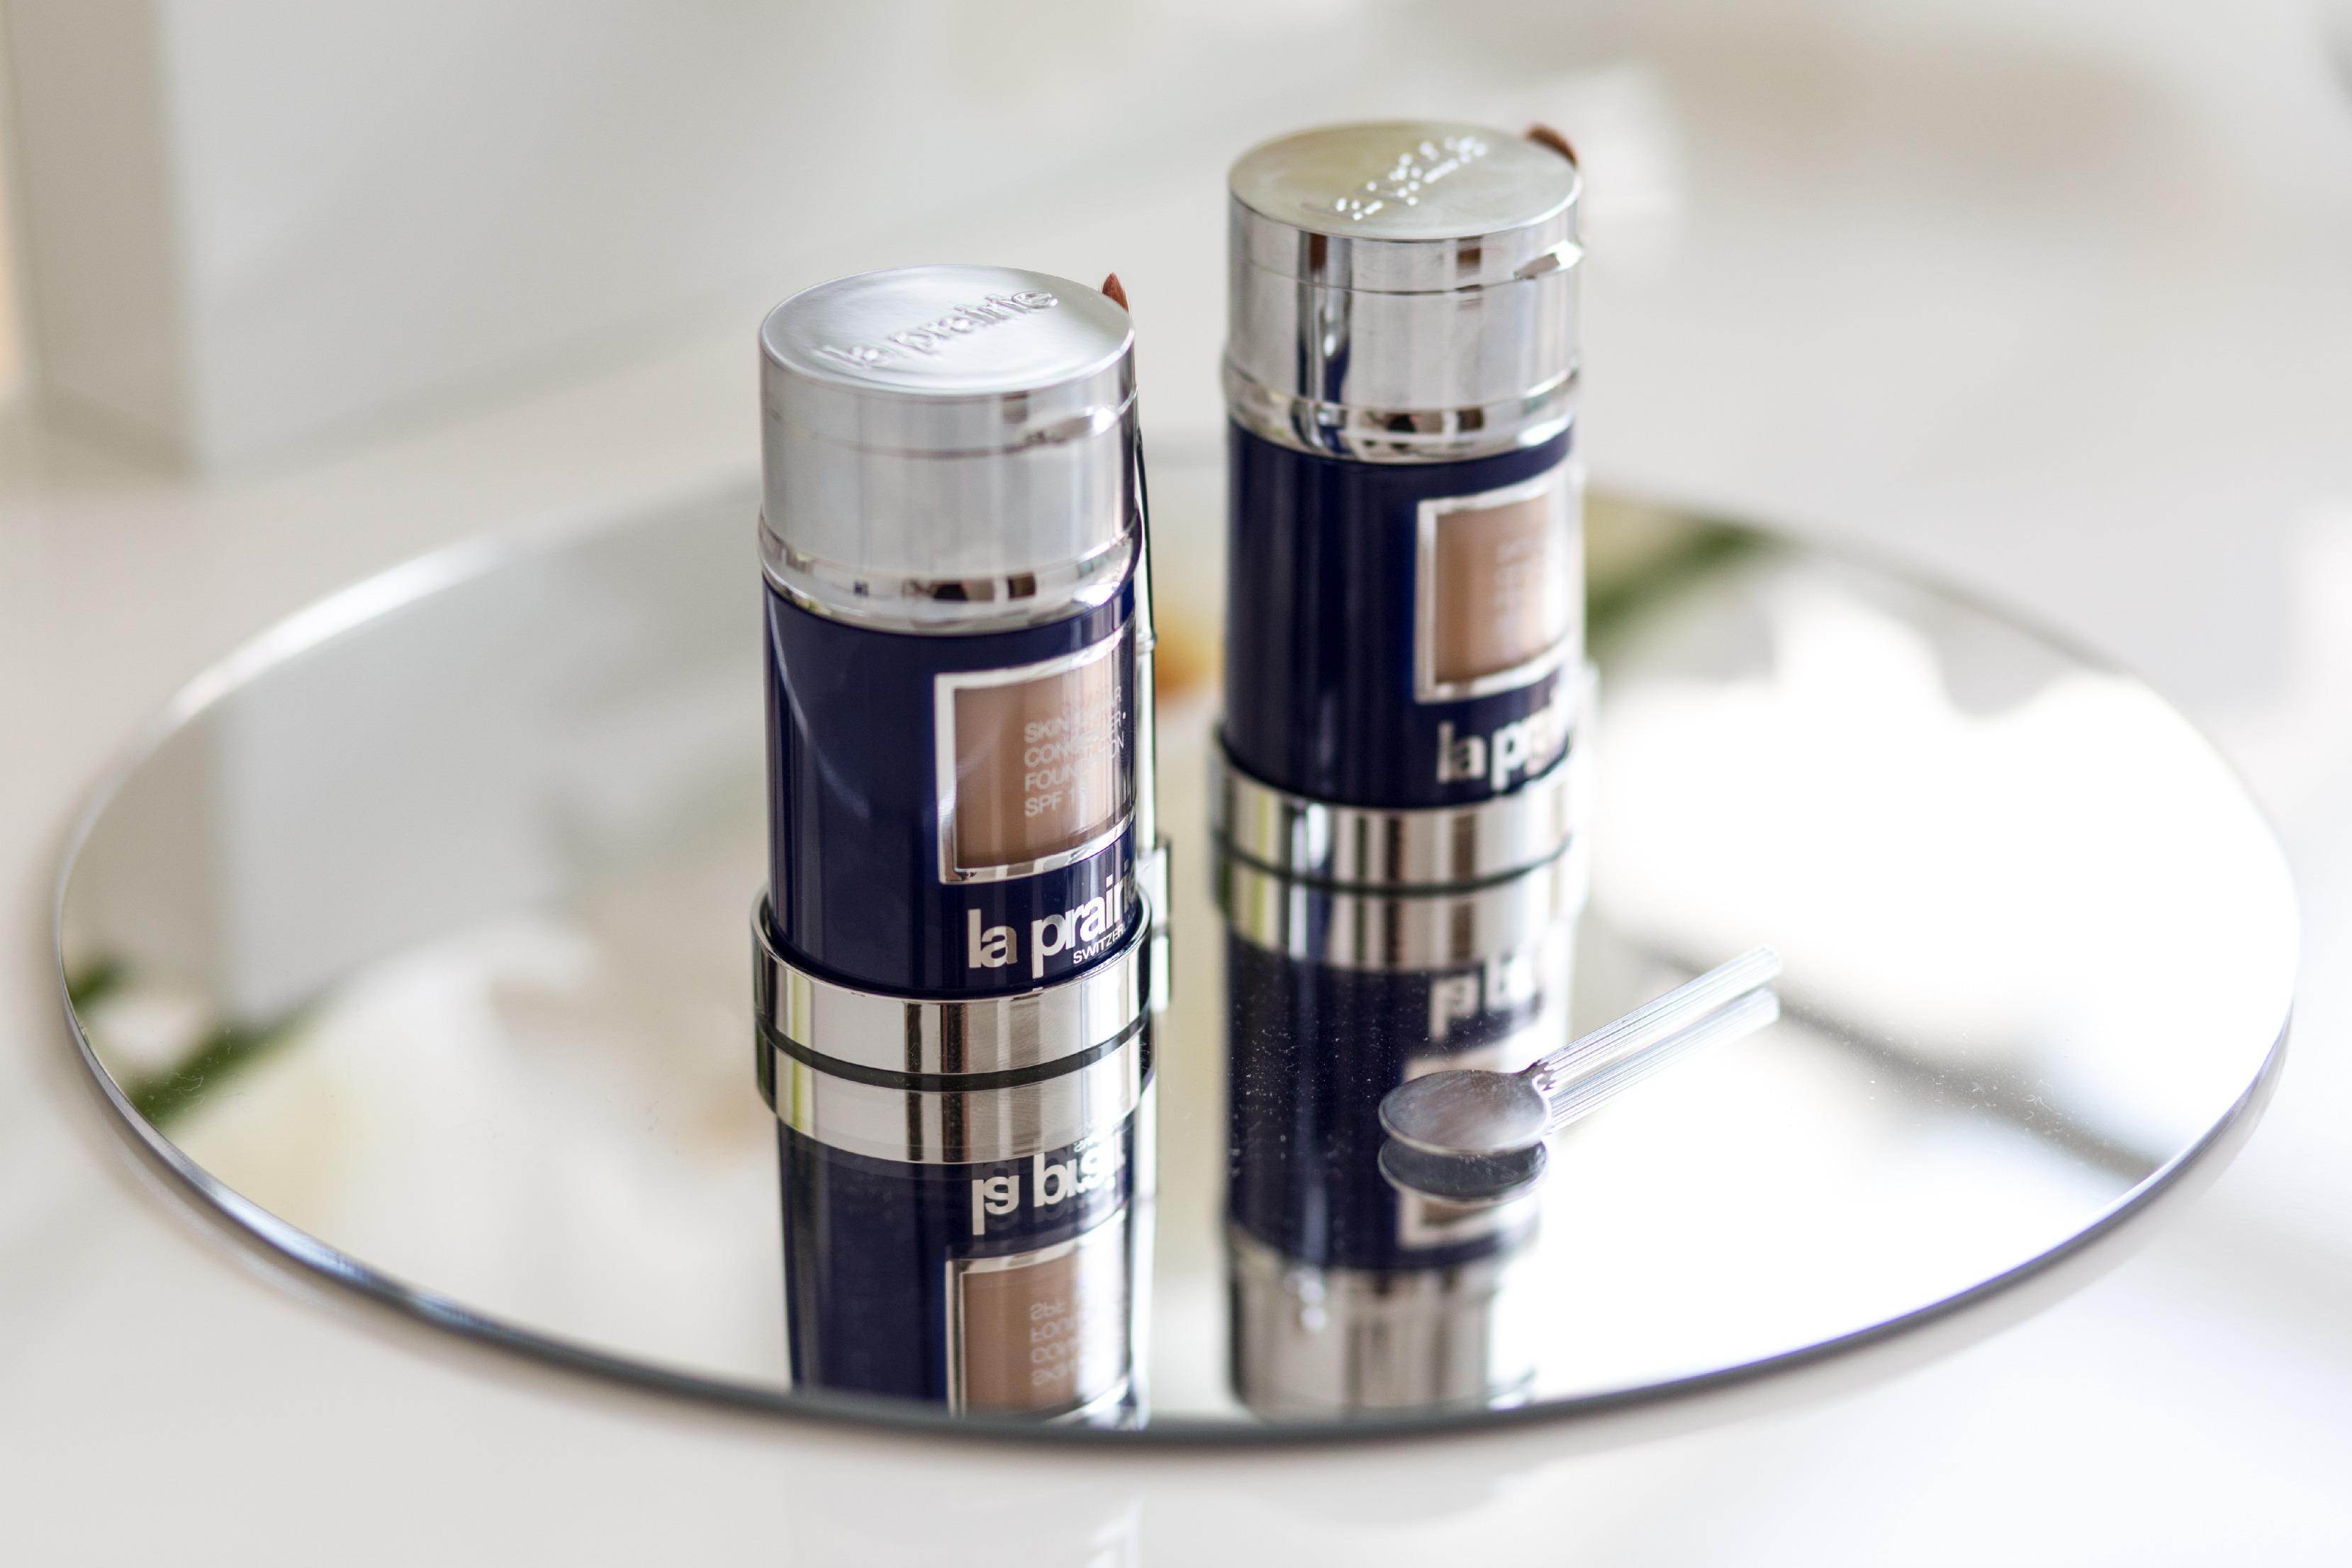 Хидратираща и стягаща основа за грим Skin Caviar Concealer Foundation SPF 15 от La Prairie